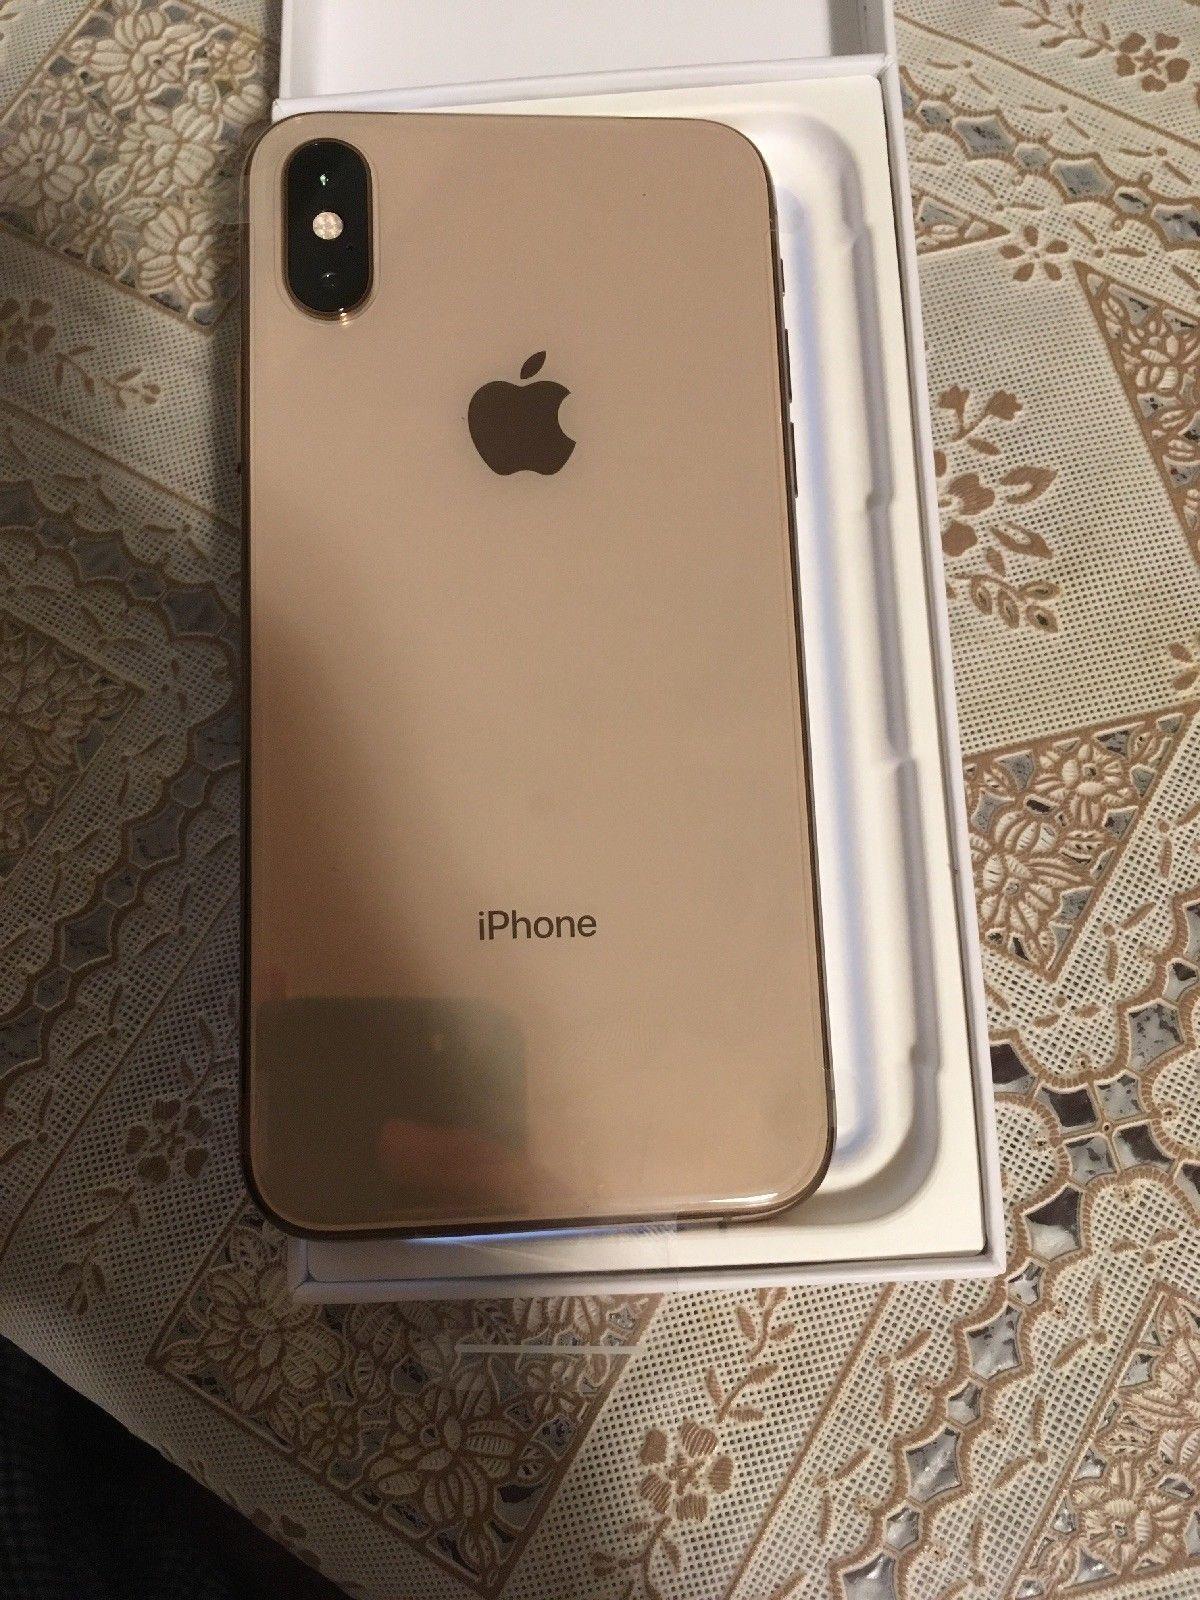 New Apple Iphone Xs 256gb Gold Unlocked A1920 Cdma Gsm Latest Model 1150 0 Iphone Xs Iphone Apple Smartphone Apple Iphone